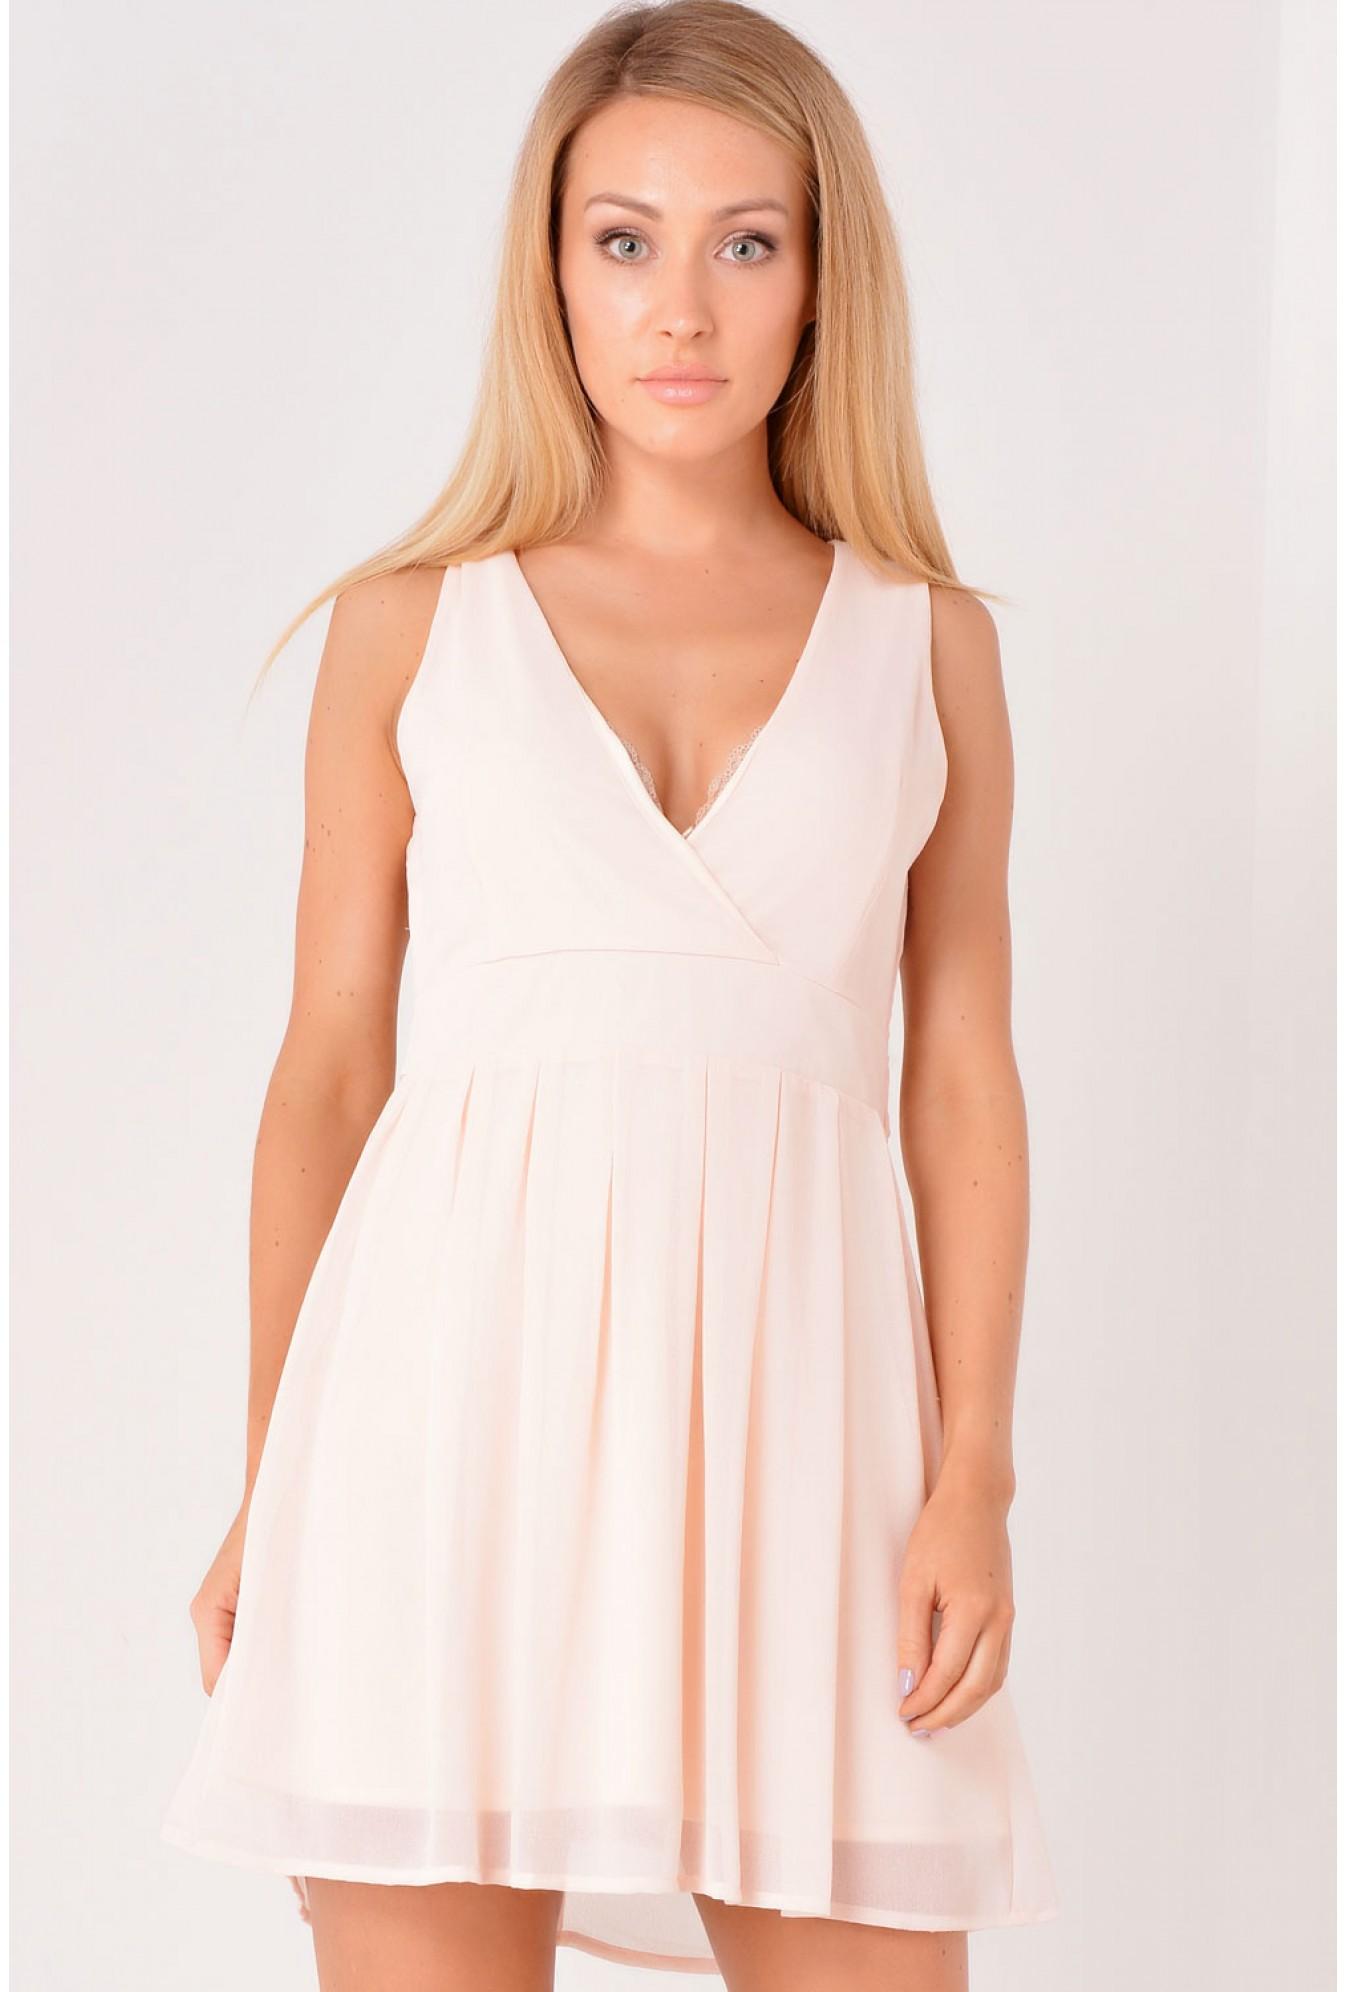 Pink Fiona Chiffon Skater Dress in Light Pink  cc8e81883